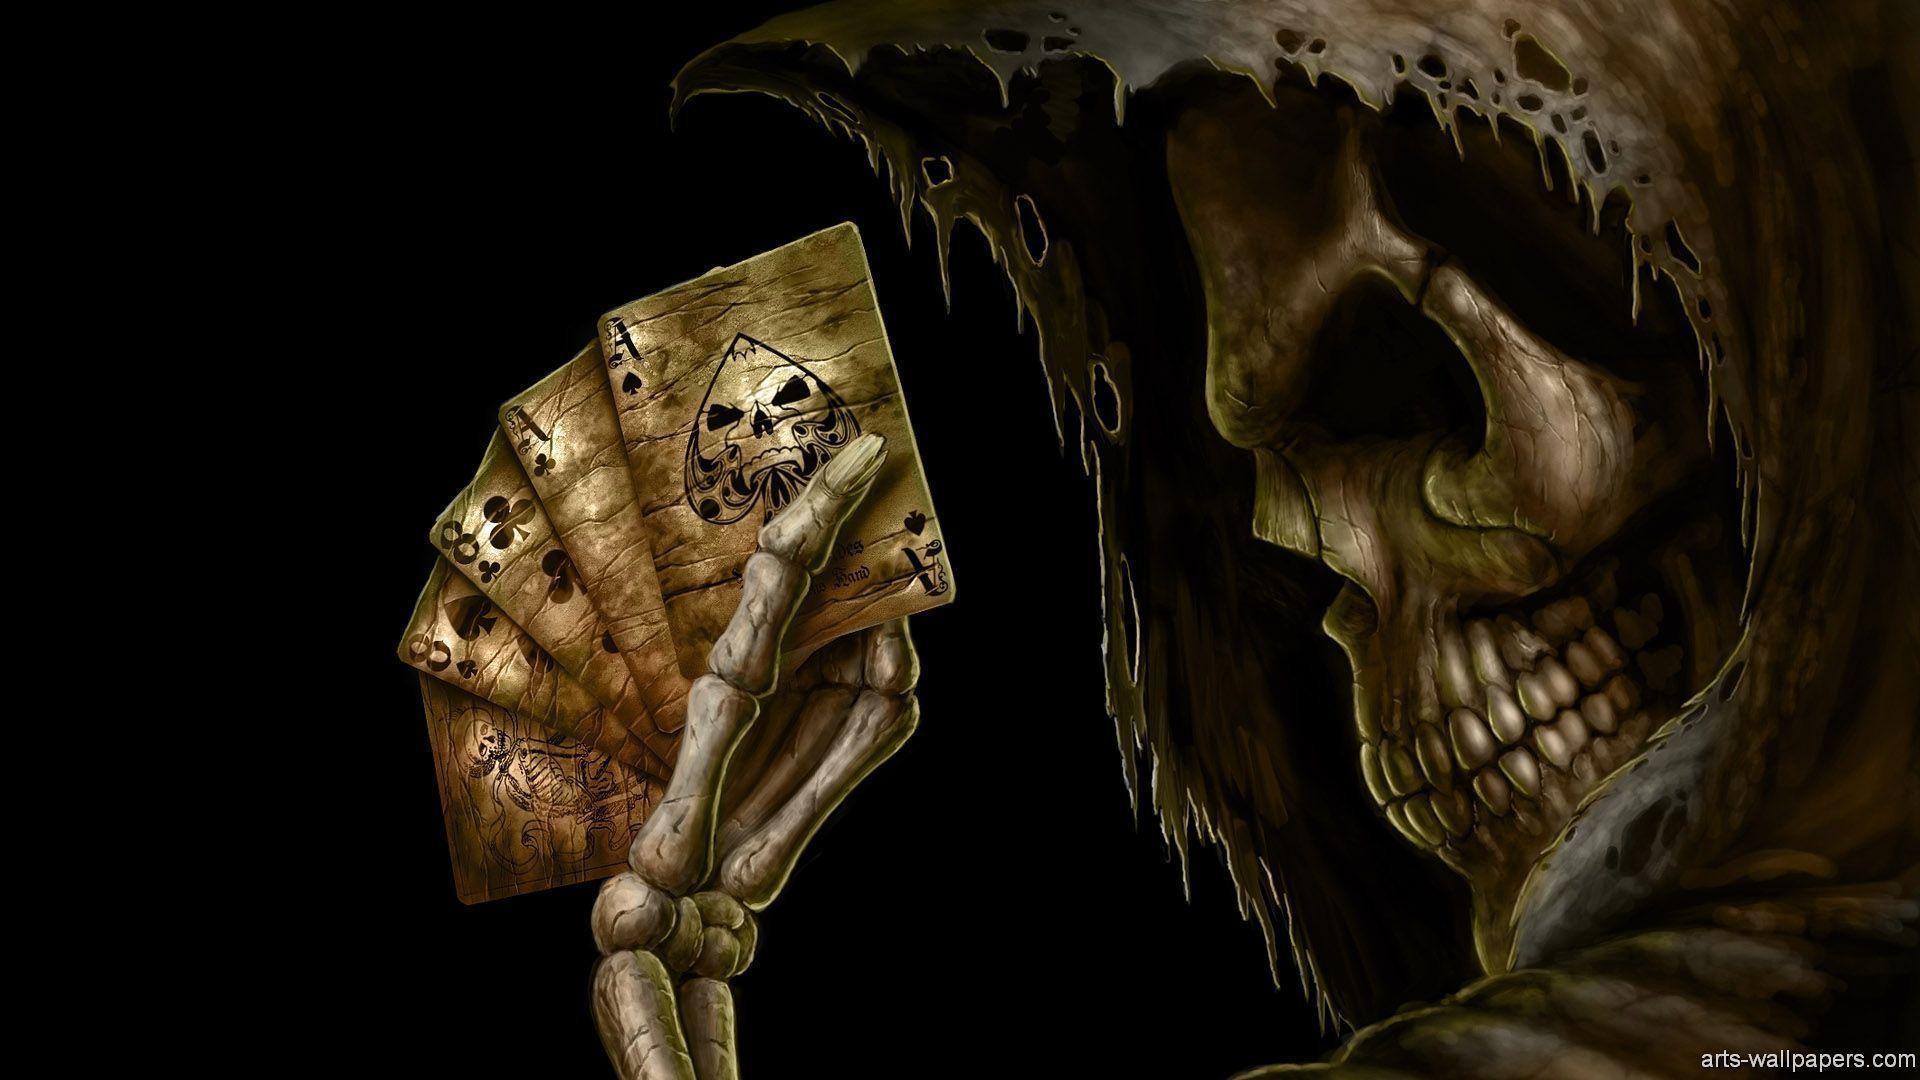 Cool Skull Wallpapers 6267 Wallpapers HD | colourinwallpaper.